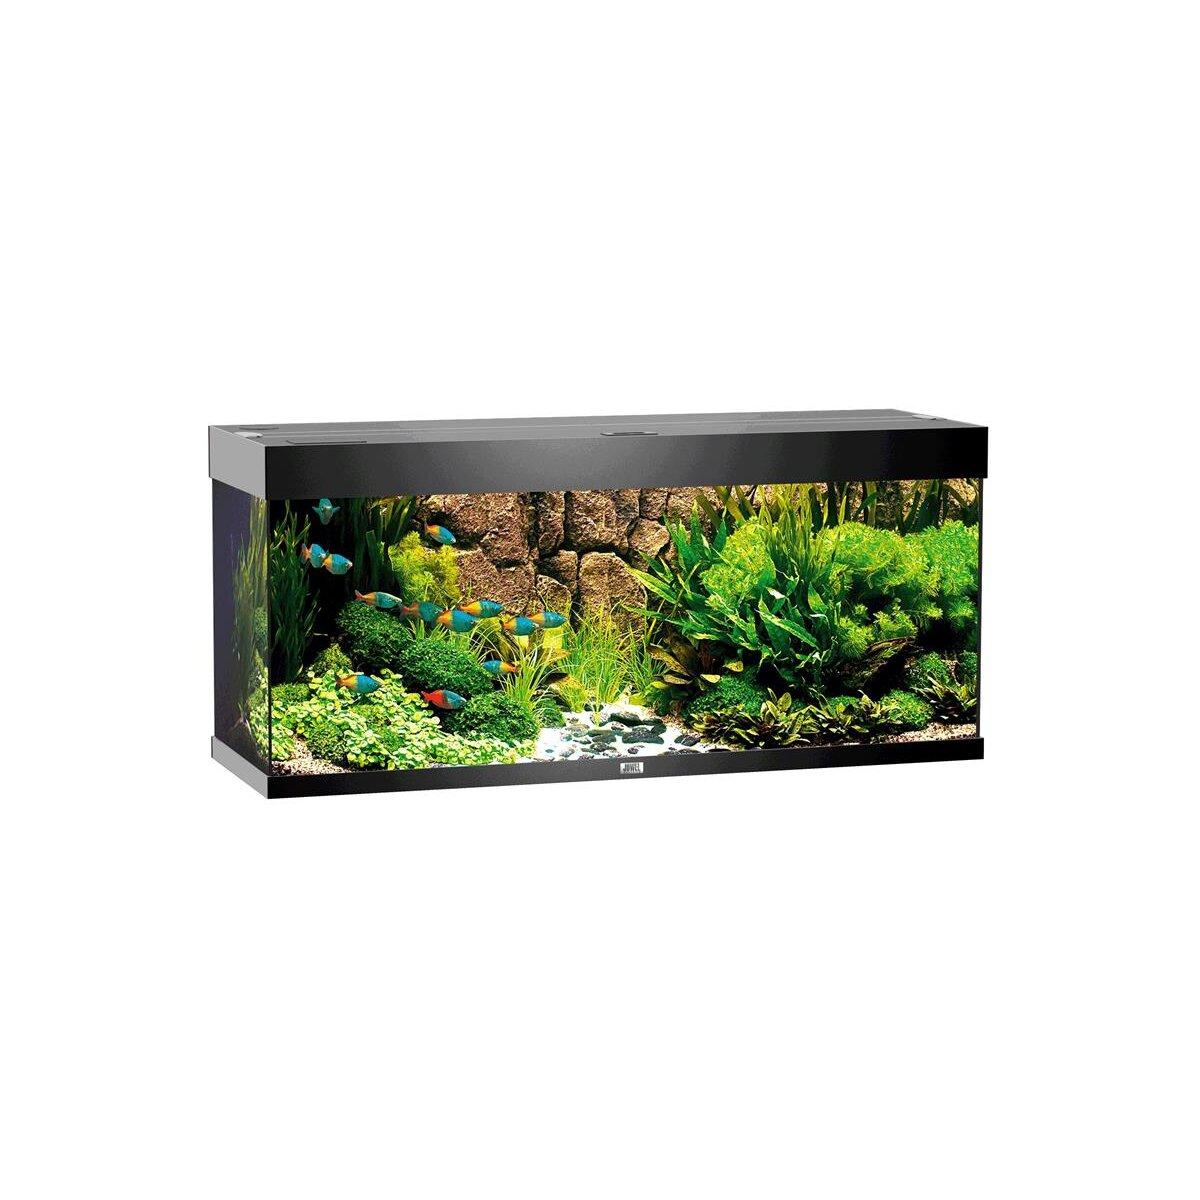 juwel aquarium rio 240 led schwarz chf. Black Bedroom Furniture Sets. Home Design Ideas